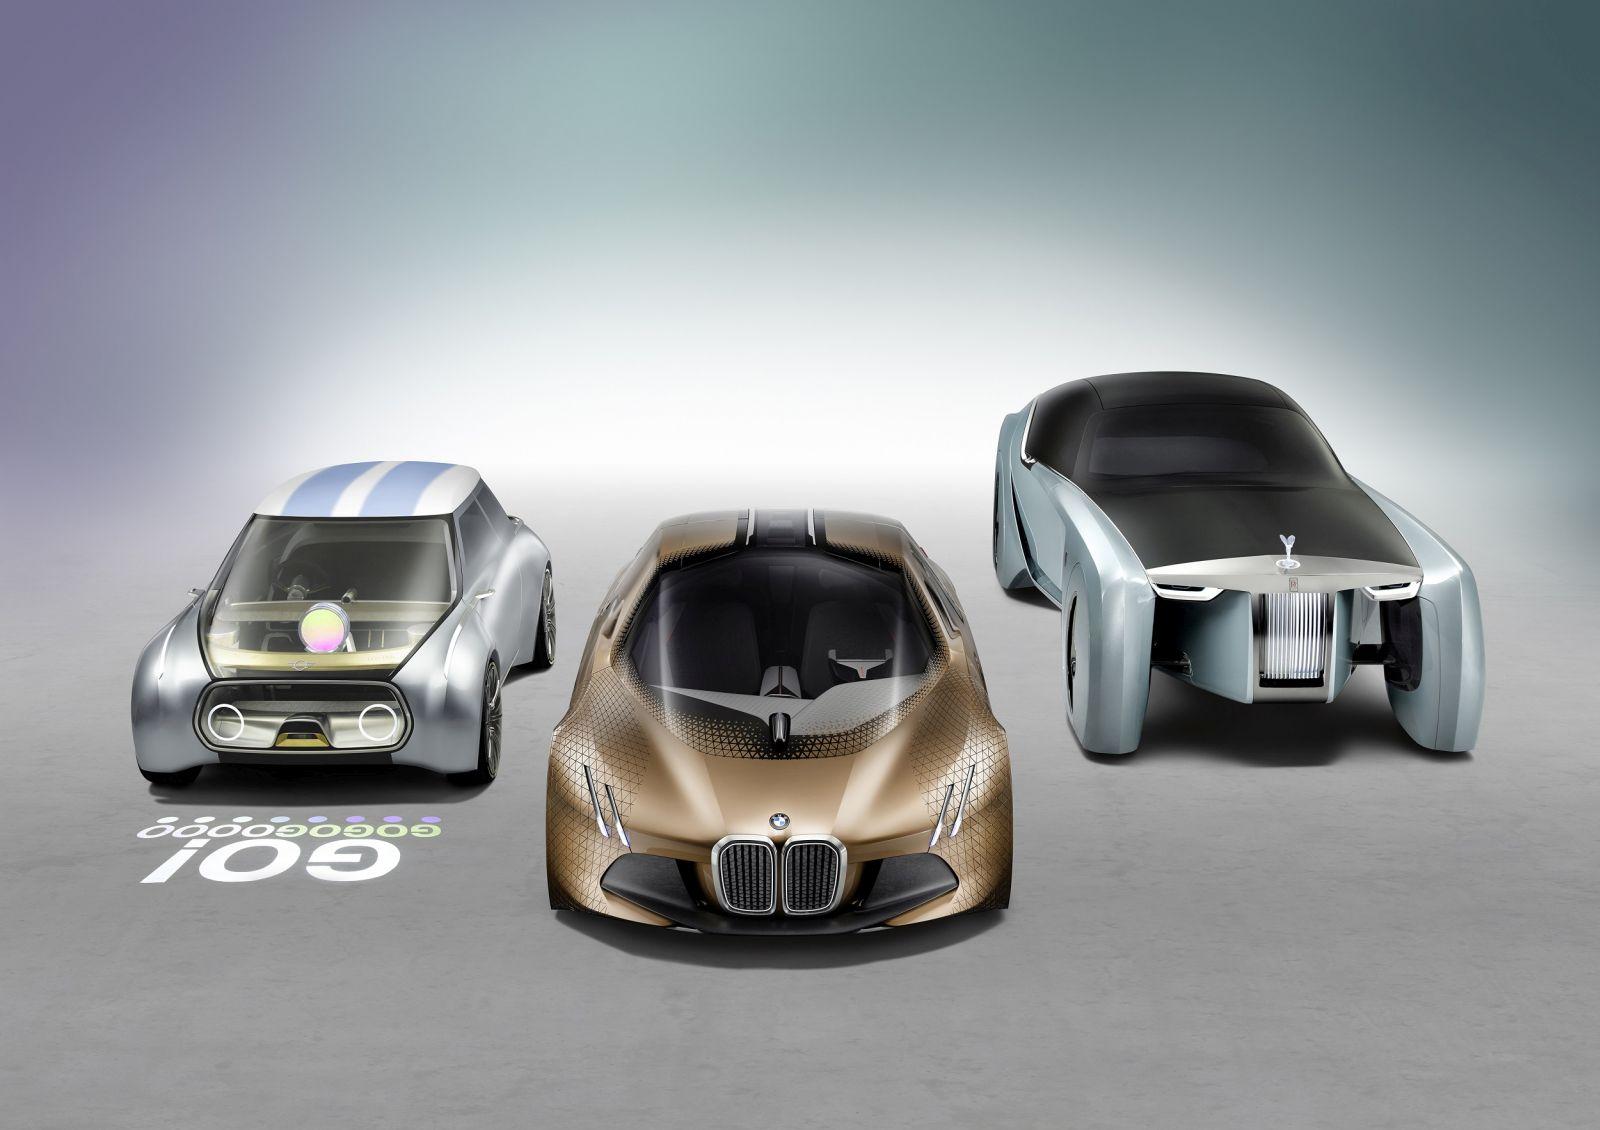 BMW Group VISION NEXT 100 Vehicles